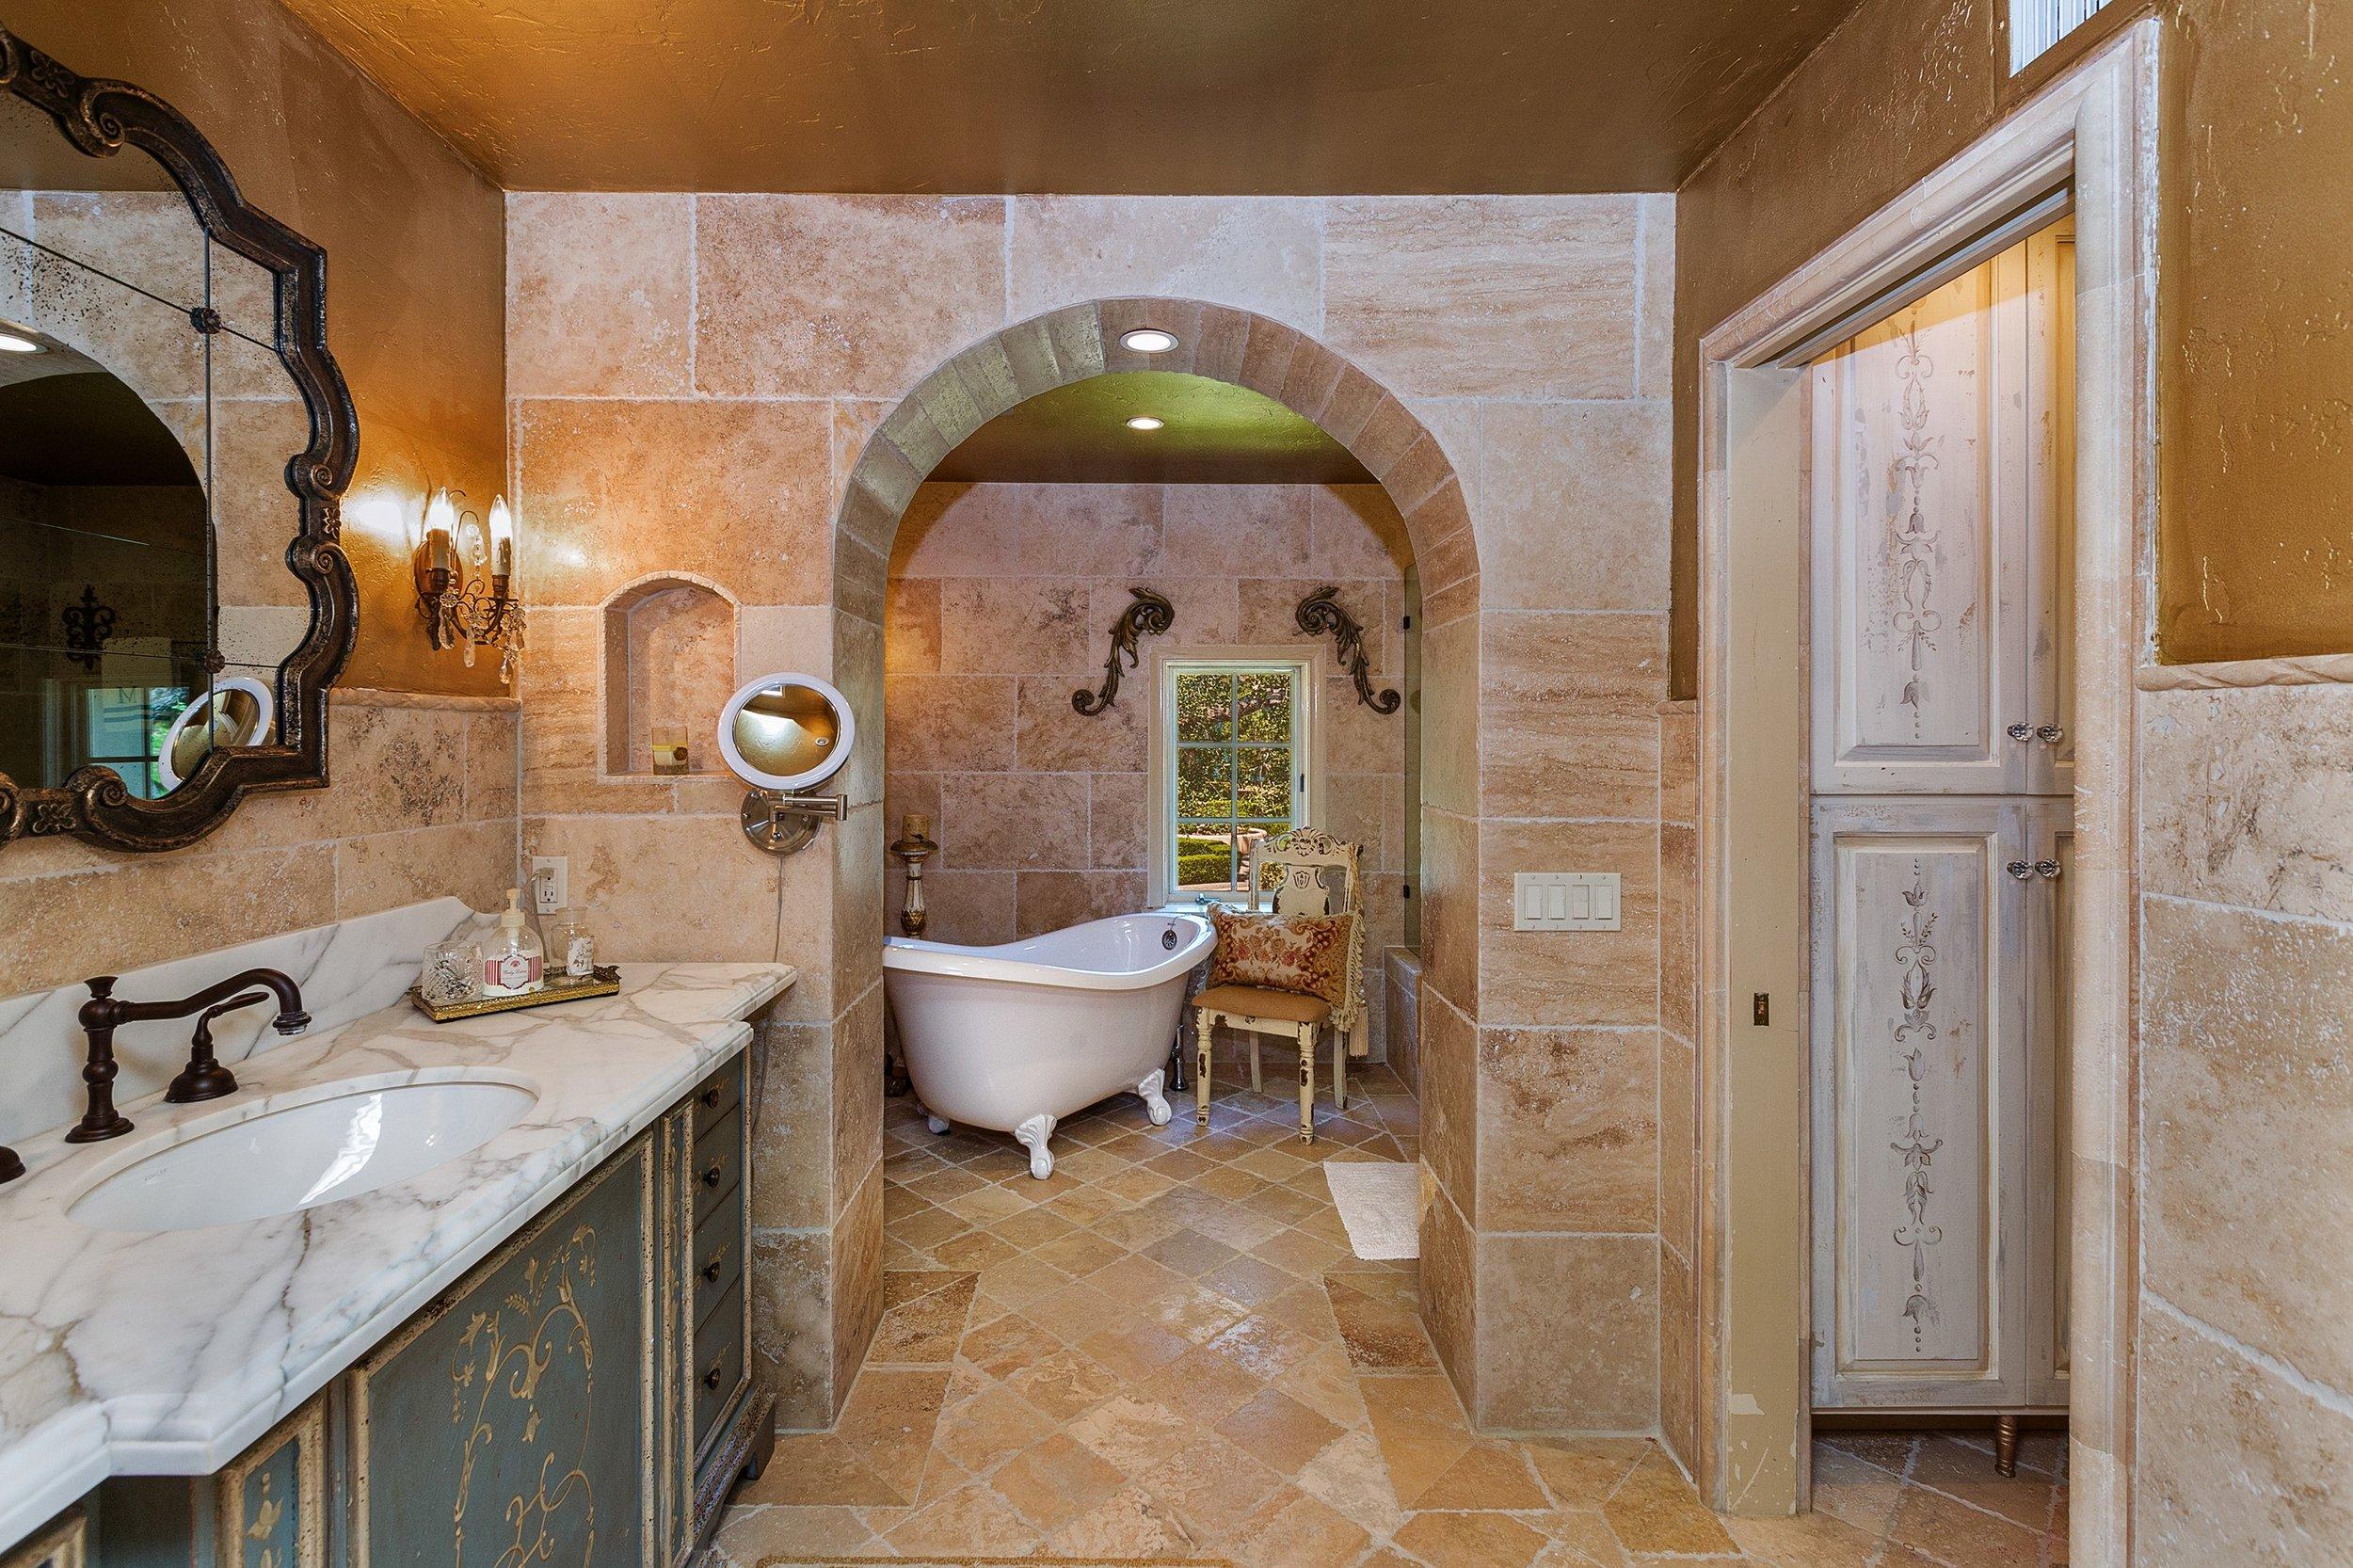 047_Bathroom.jpg